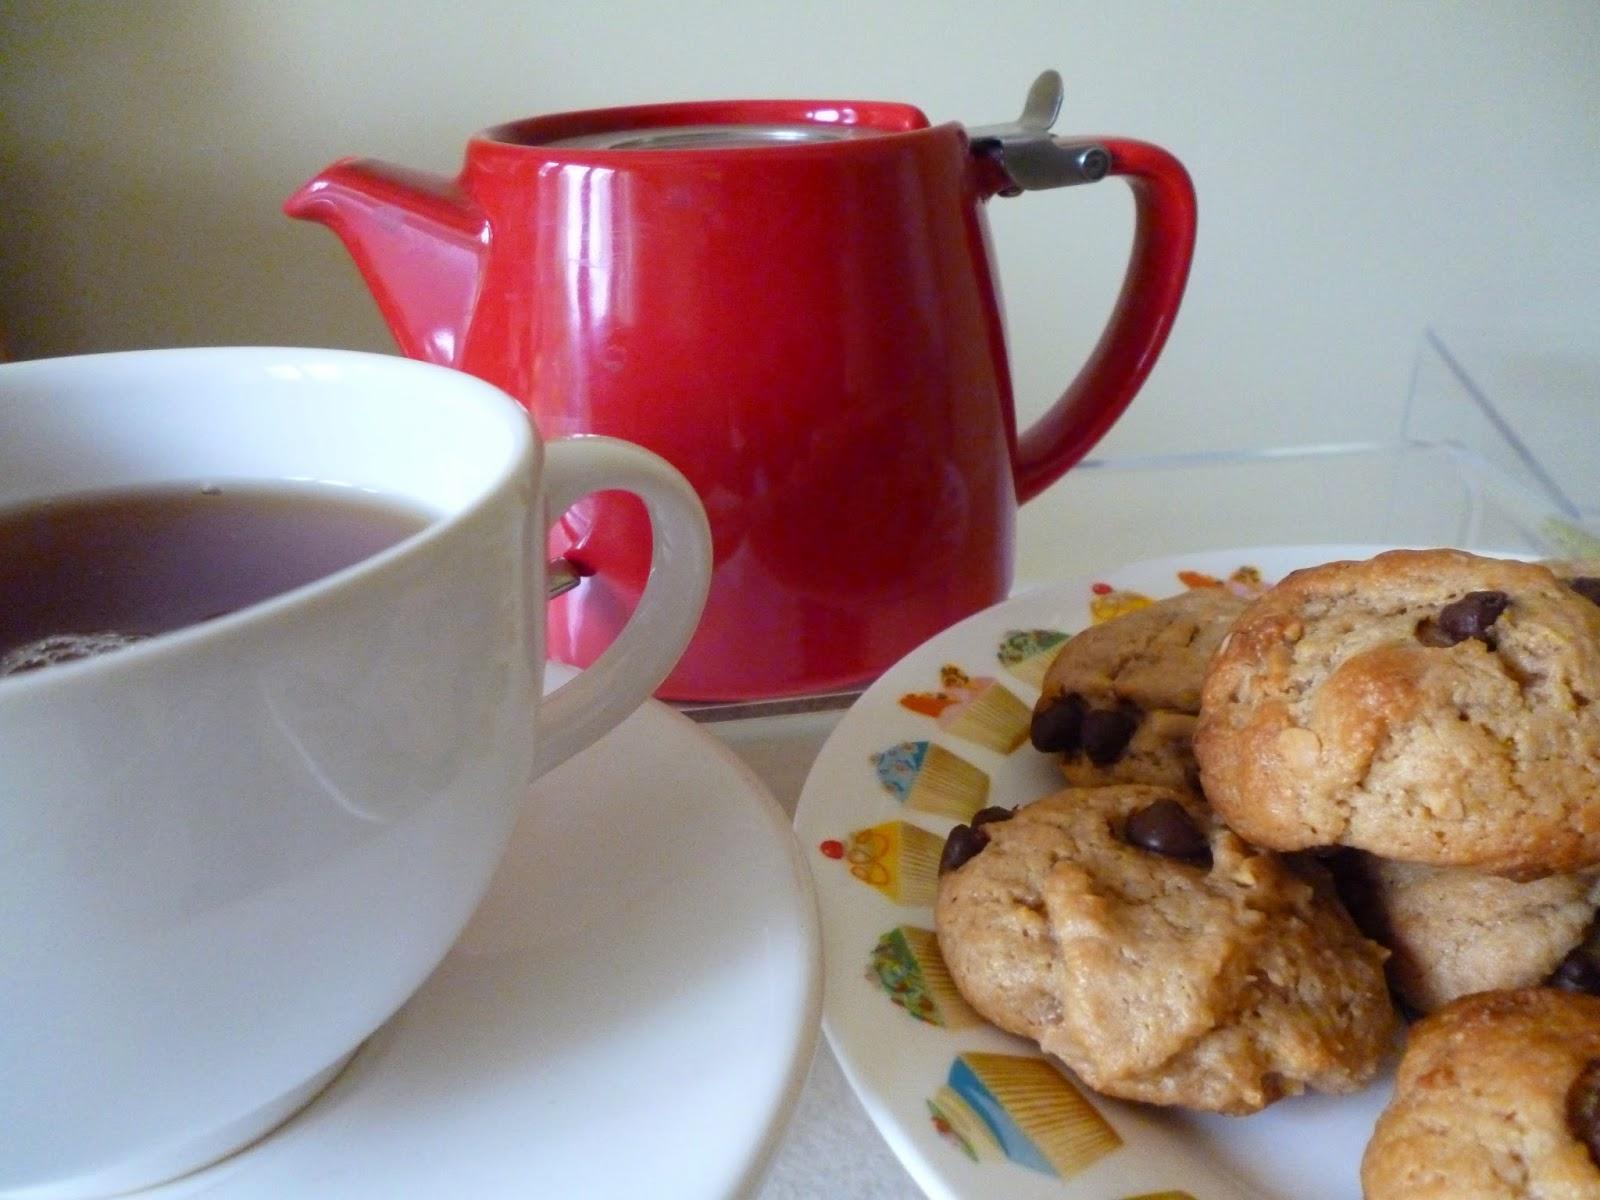 Recipe for Vegan Cookies Peanut Butter and Banana